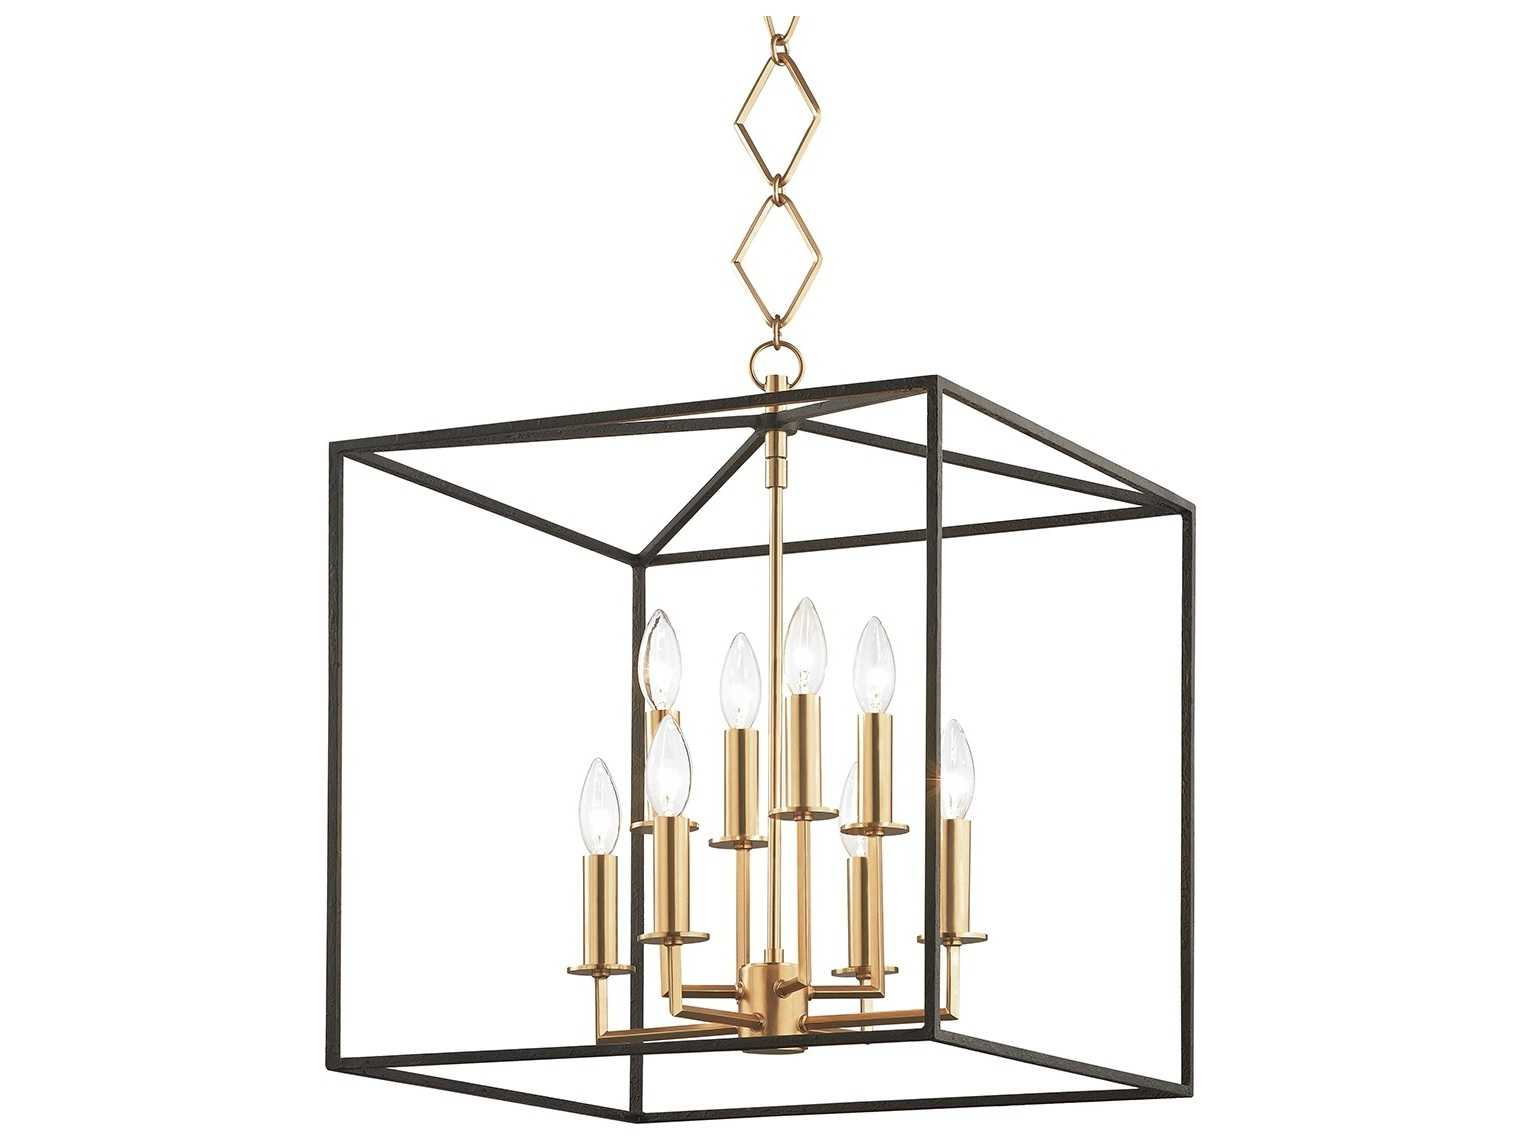 Hudson Valley Lighting Richie Aged Brass Textured Black 8 Light 18 Wide Mini Chandelier Hvbko151agbbk